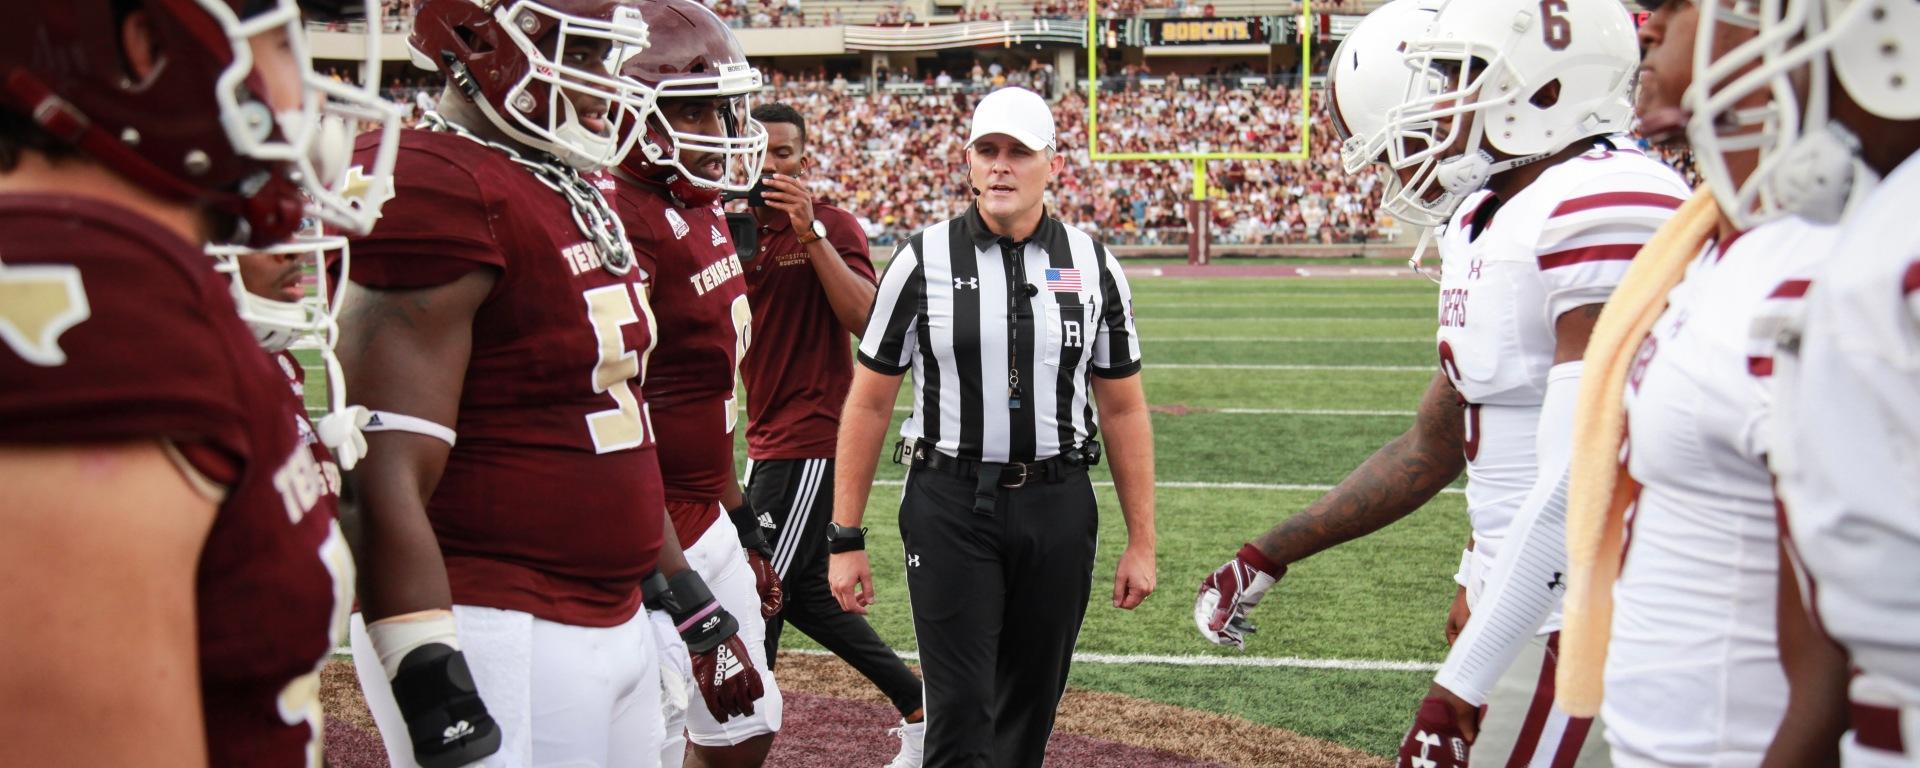 Referee between two opposing college football teams.